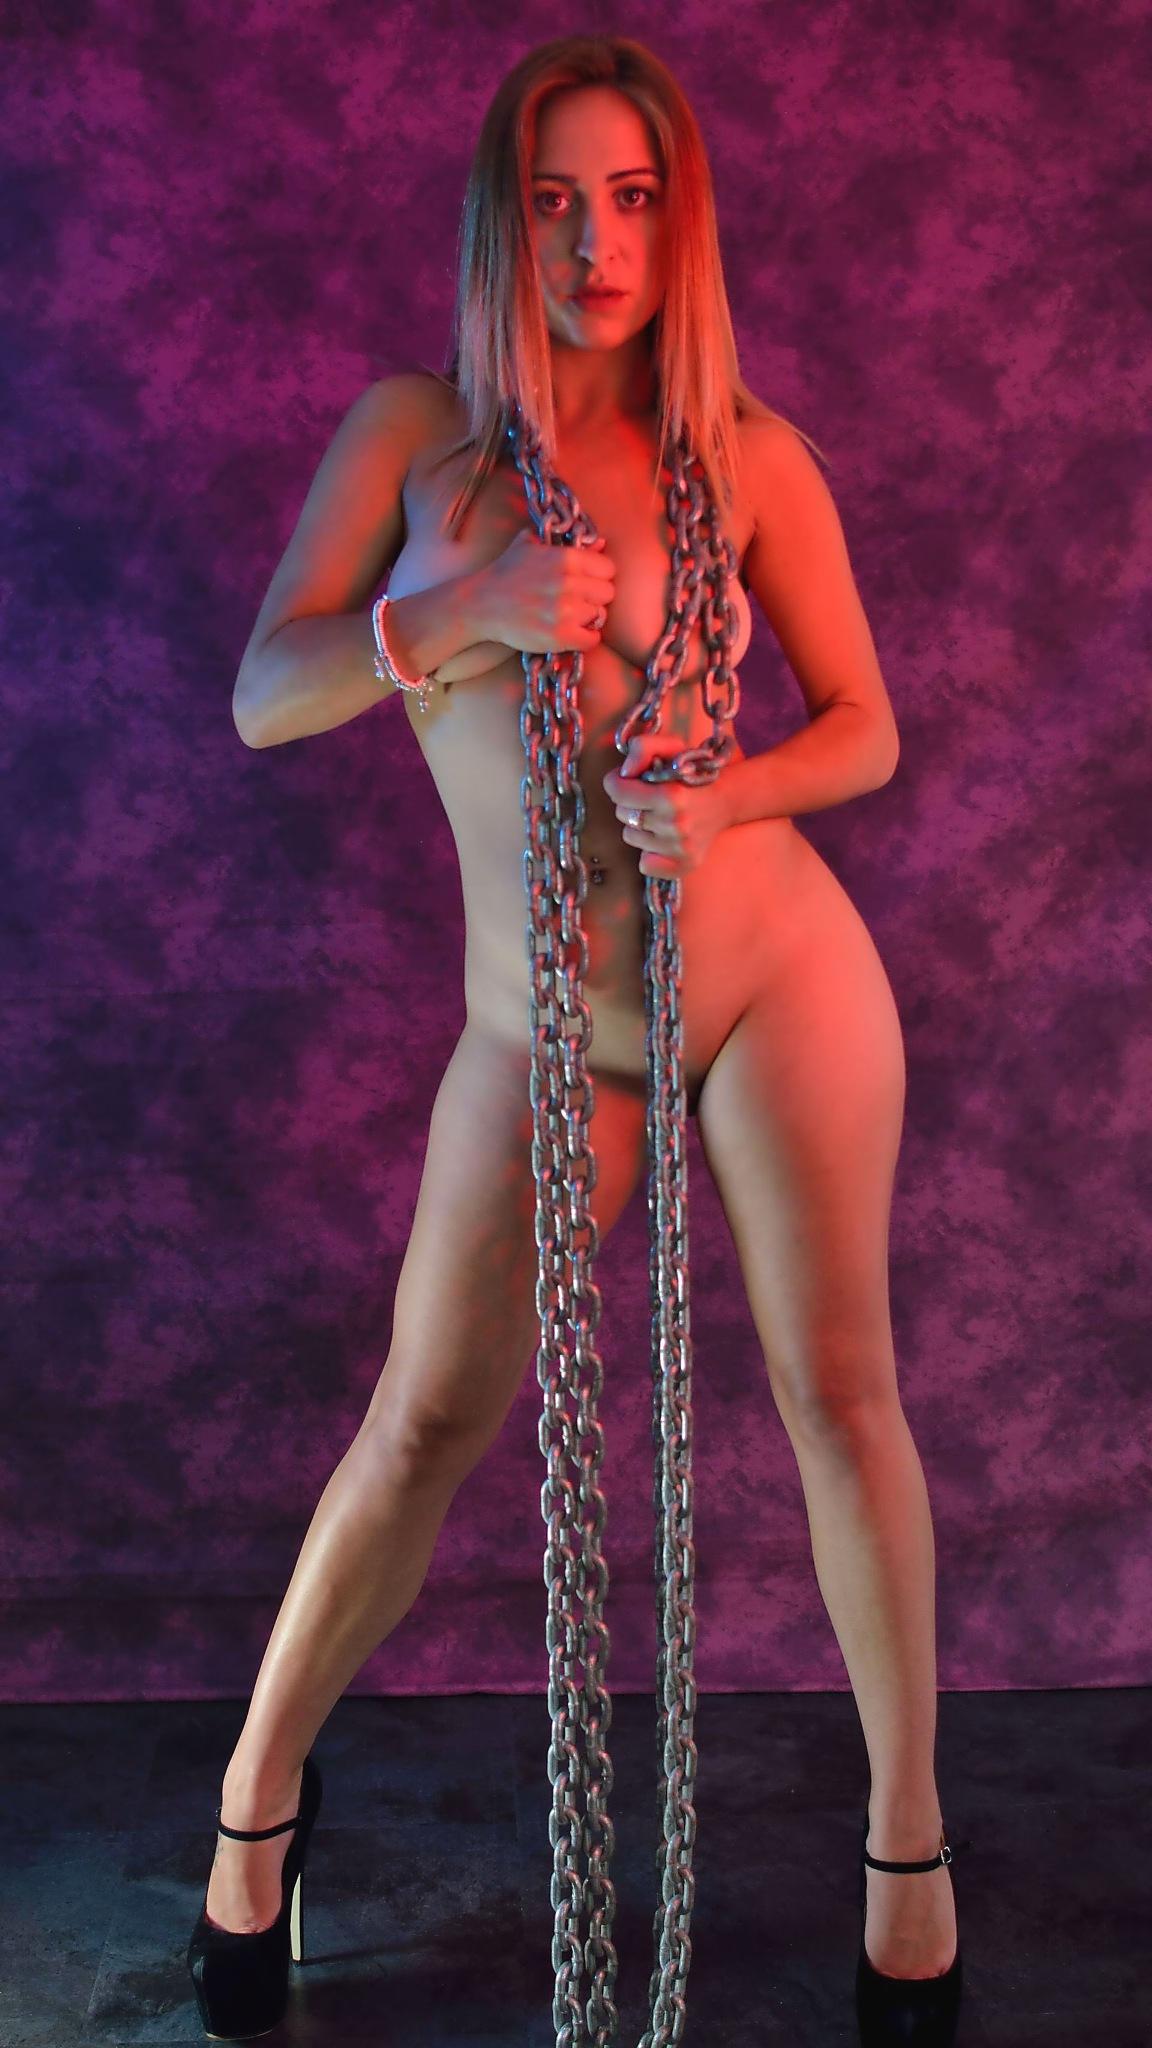 Sam in chains...again by ianstandivan